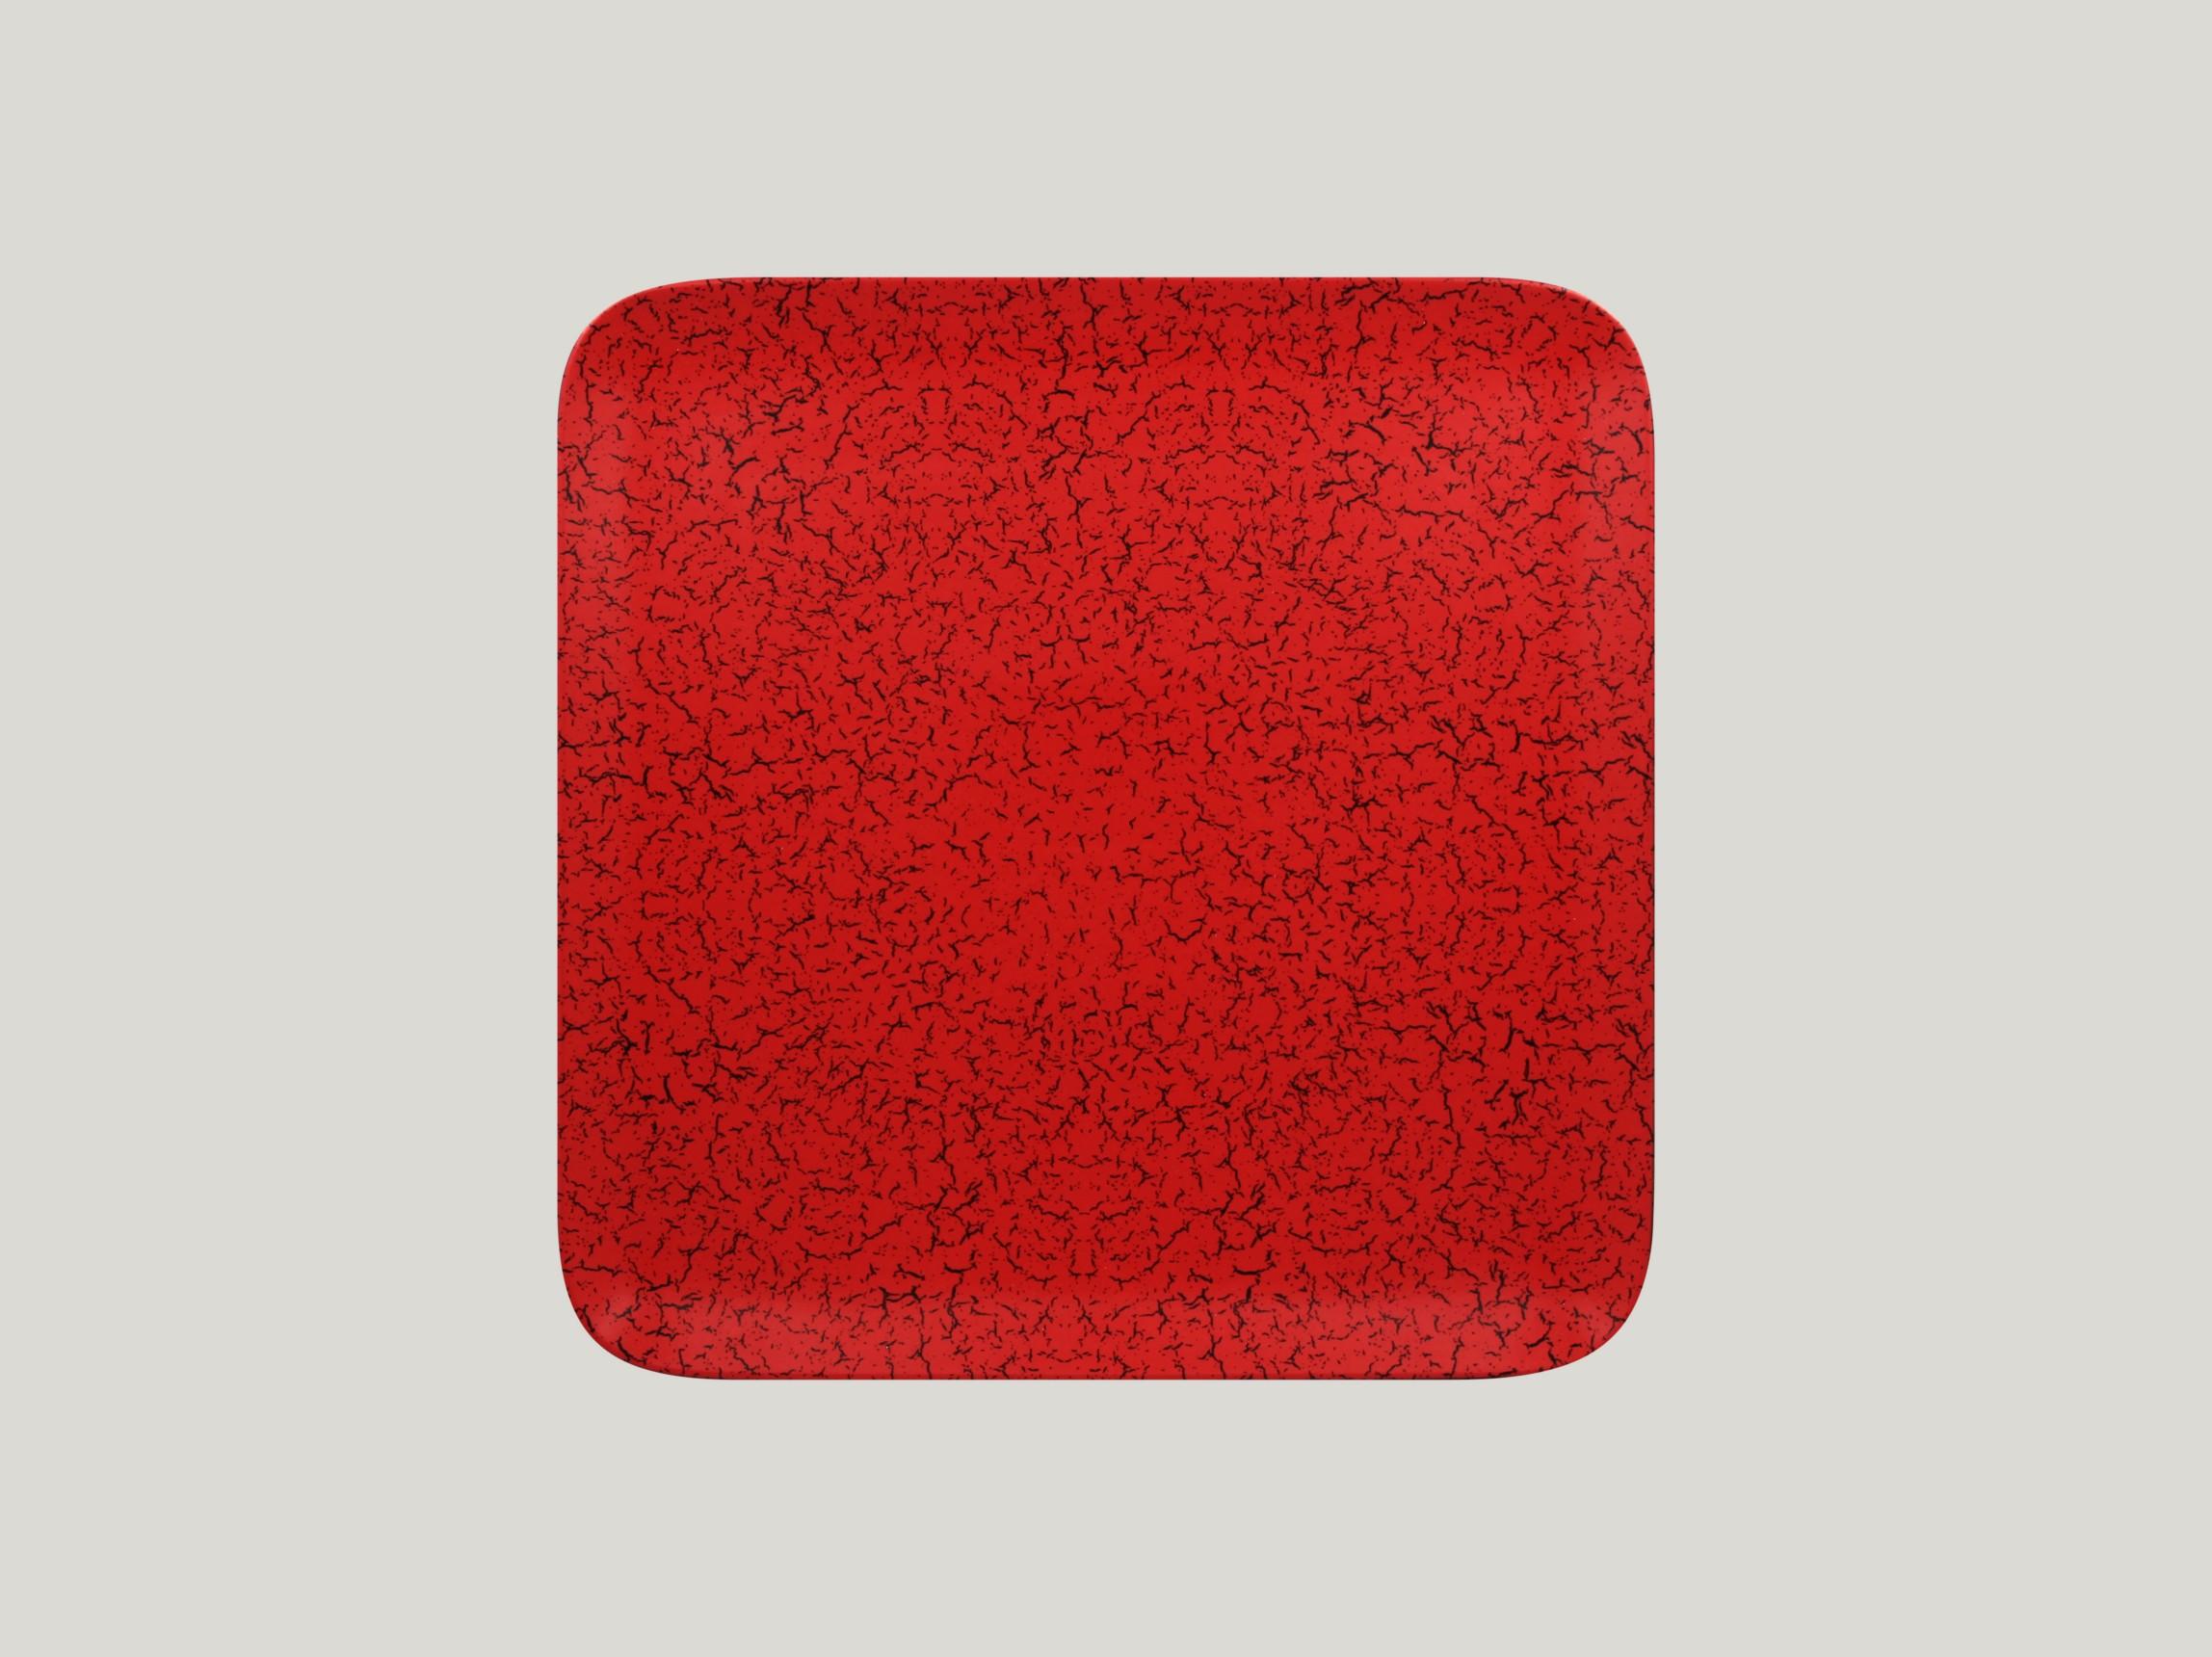 Talíř čtvercový 27 x 27 cm - červená